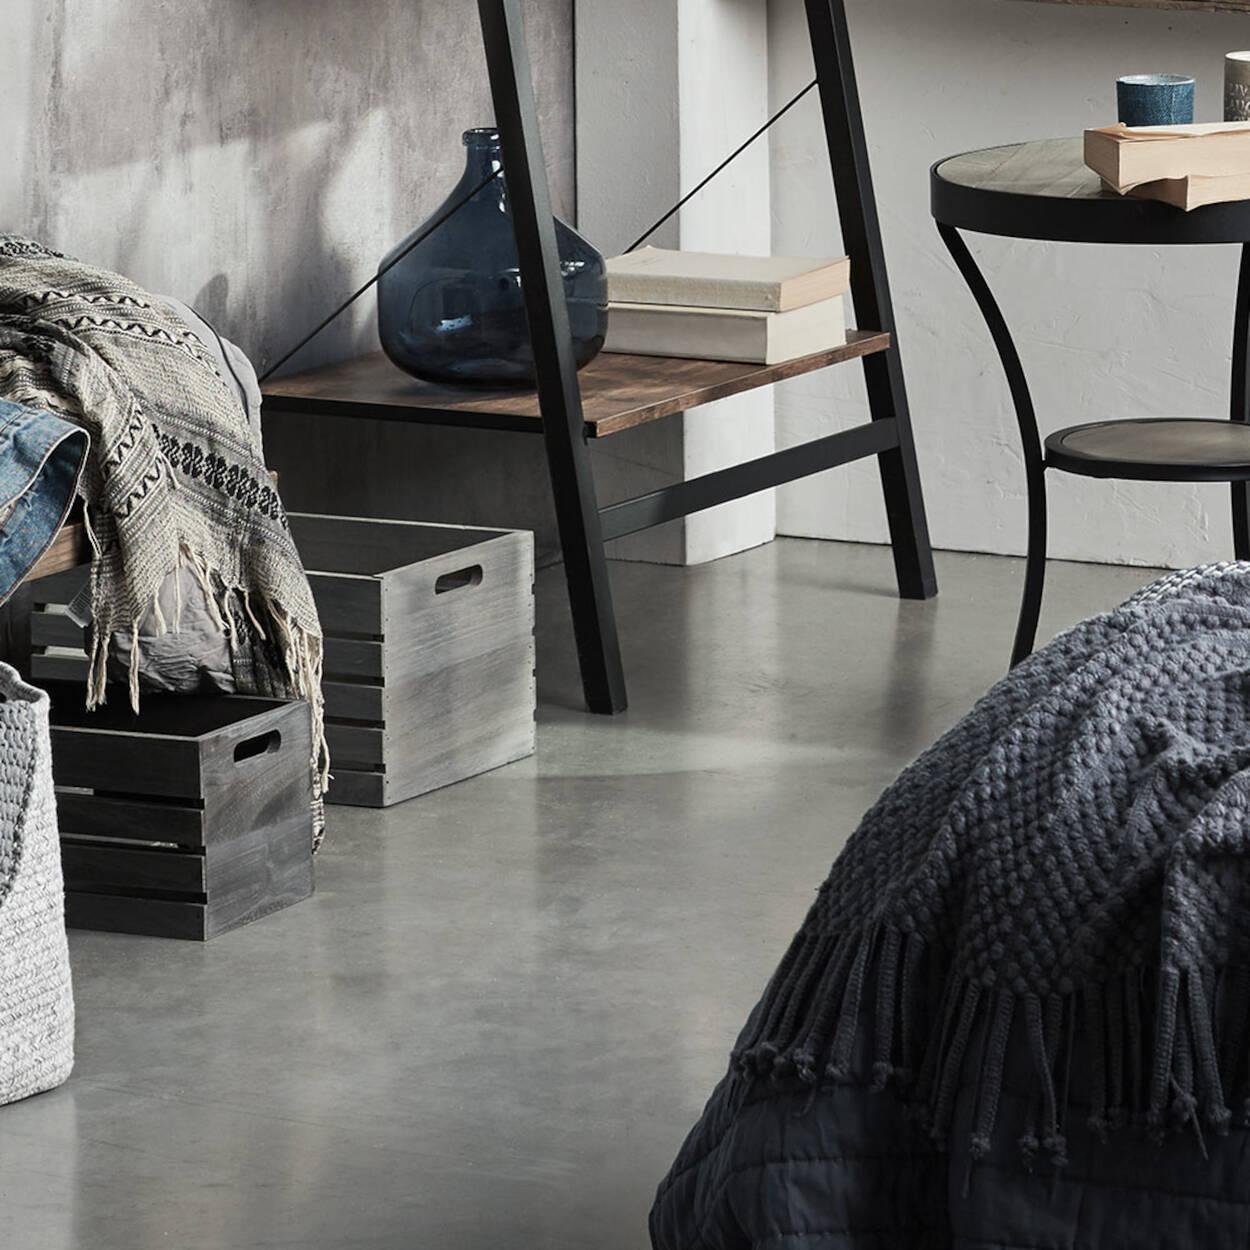 grande caisse en bois avec tableau noir. Black Bedroom Furniture Sets. Home Design Ideas